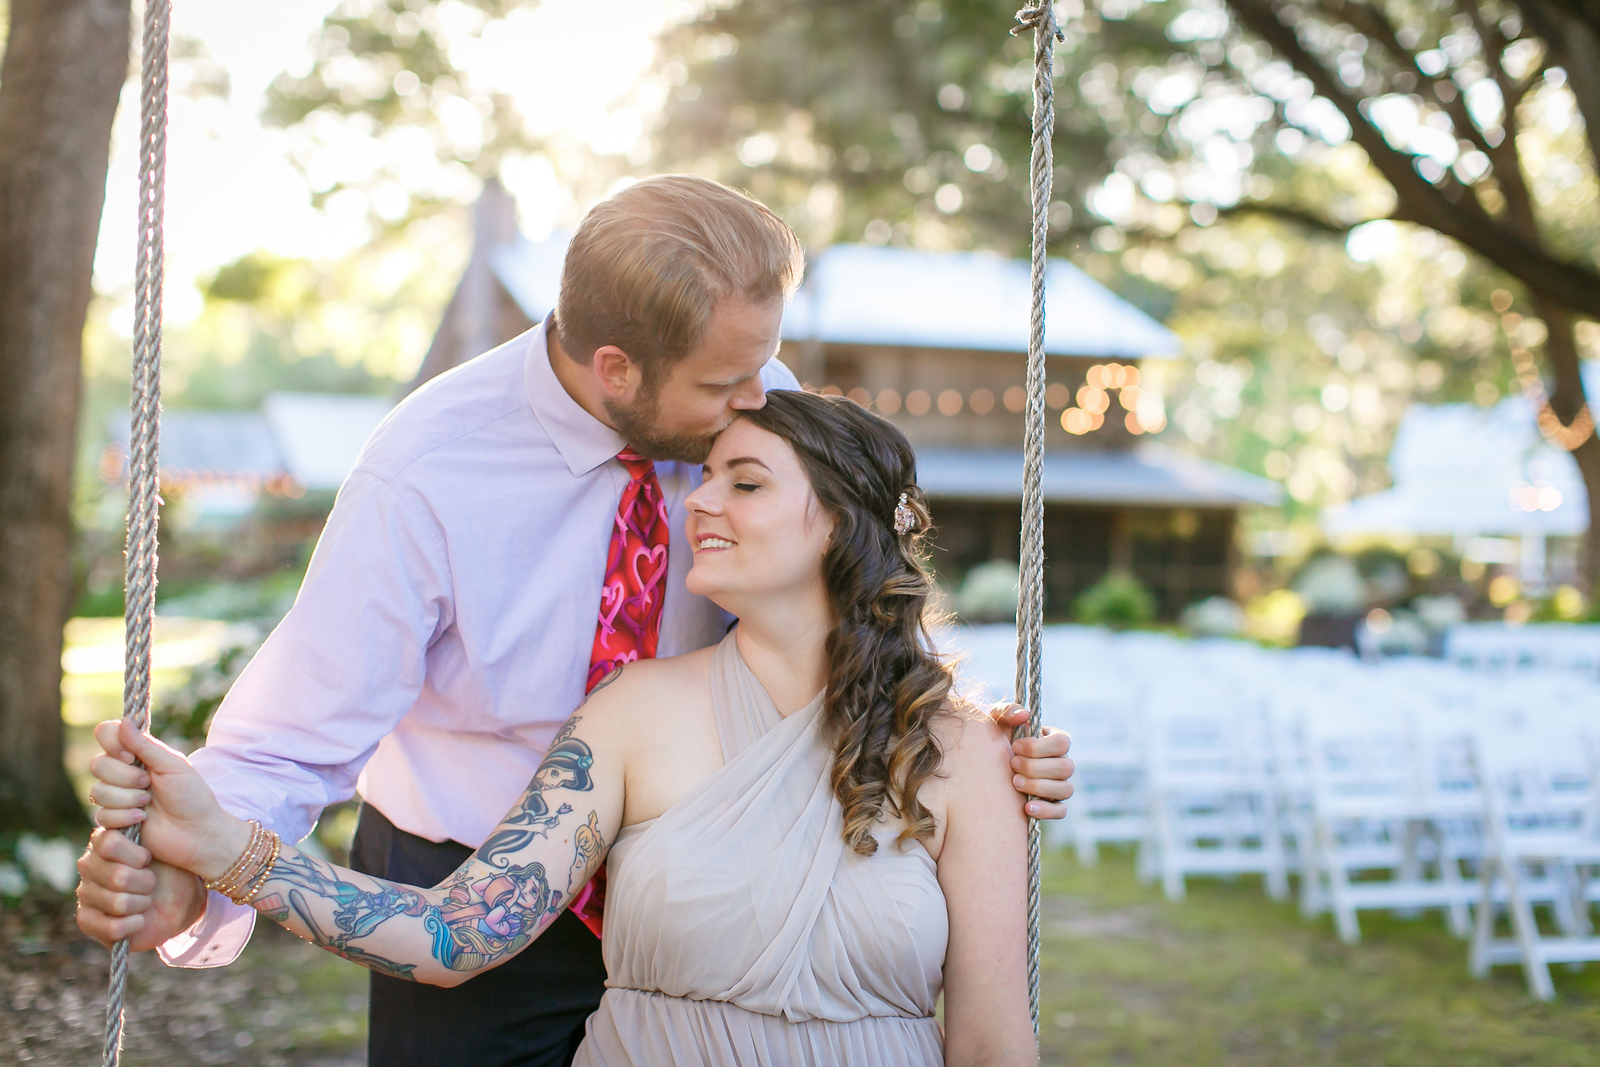 CAP2017-MadisonKyle-WEDDING-Giselle-TuckersFarmhouse-1048